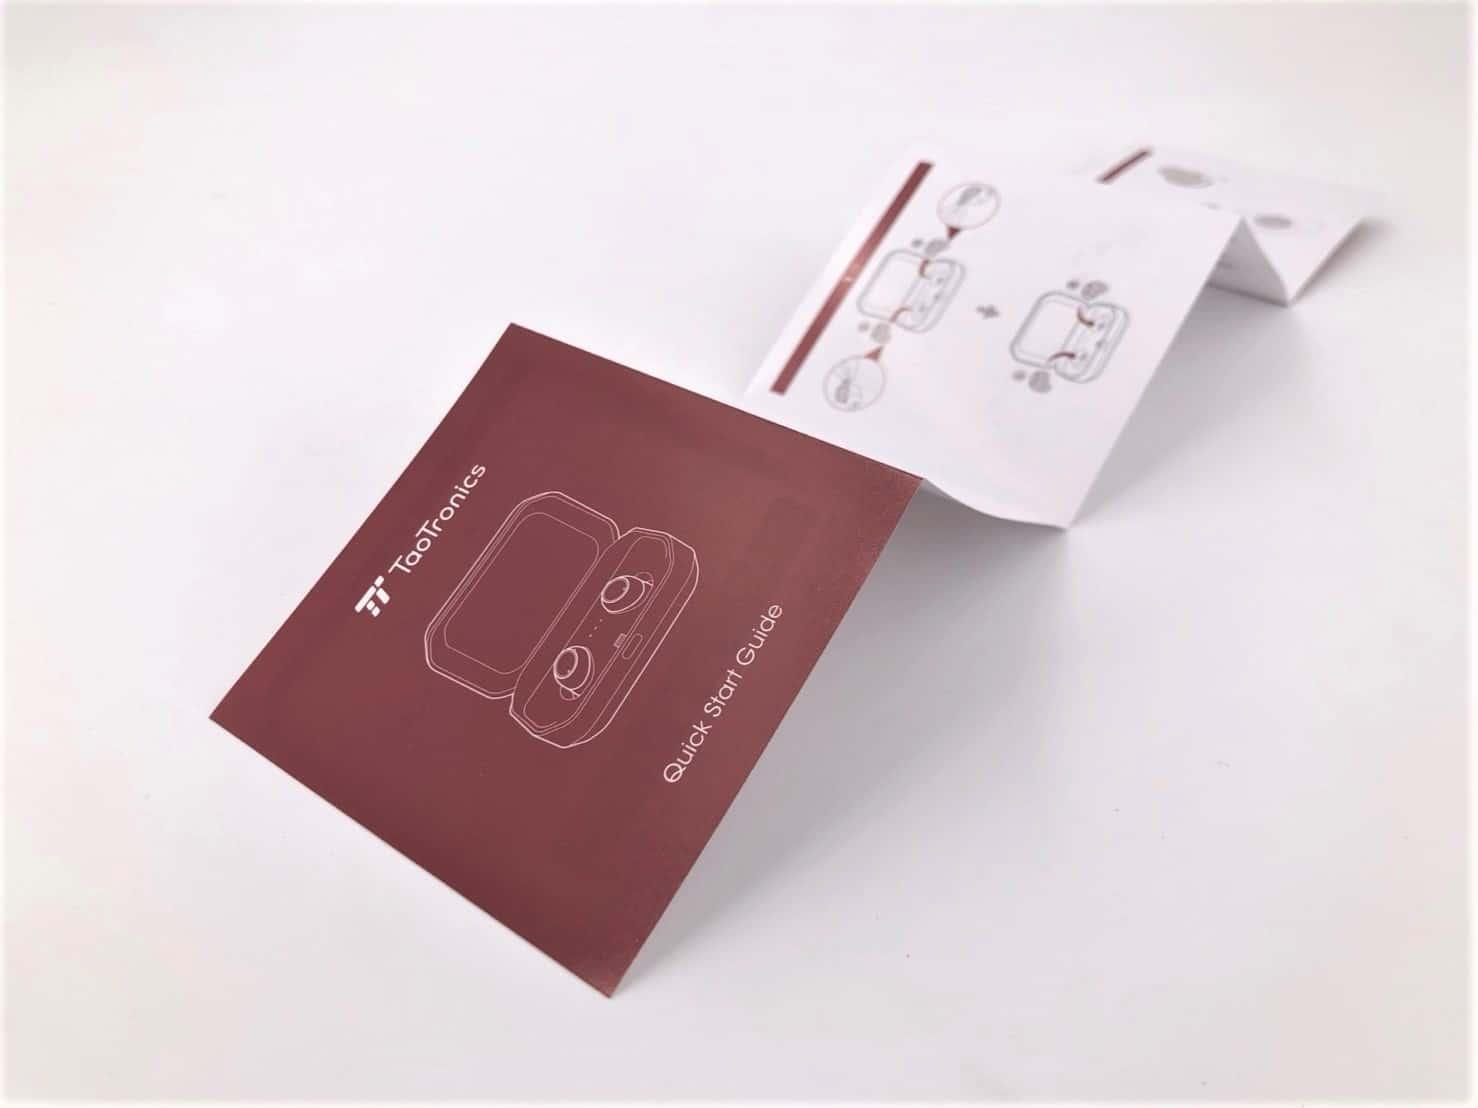 TaoTronicss TT-BH052真無線藍芽耳機推薦-CP值最高真無線藍牙耳機-快速指南